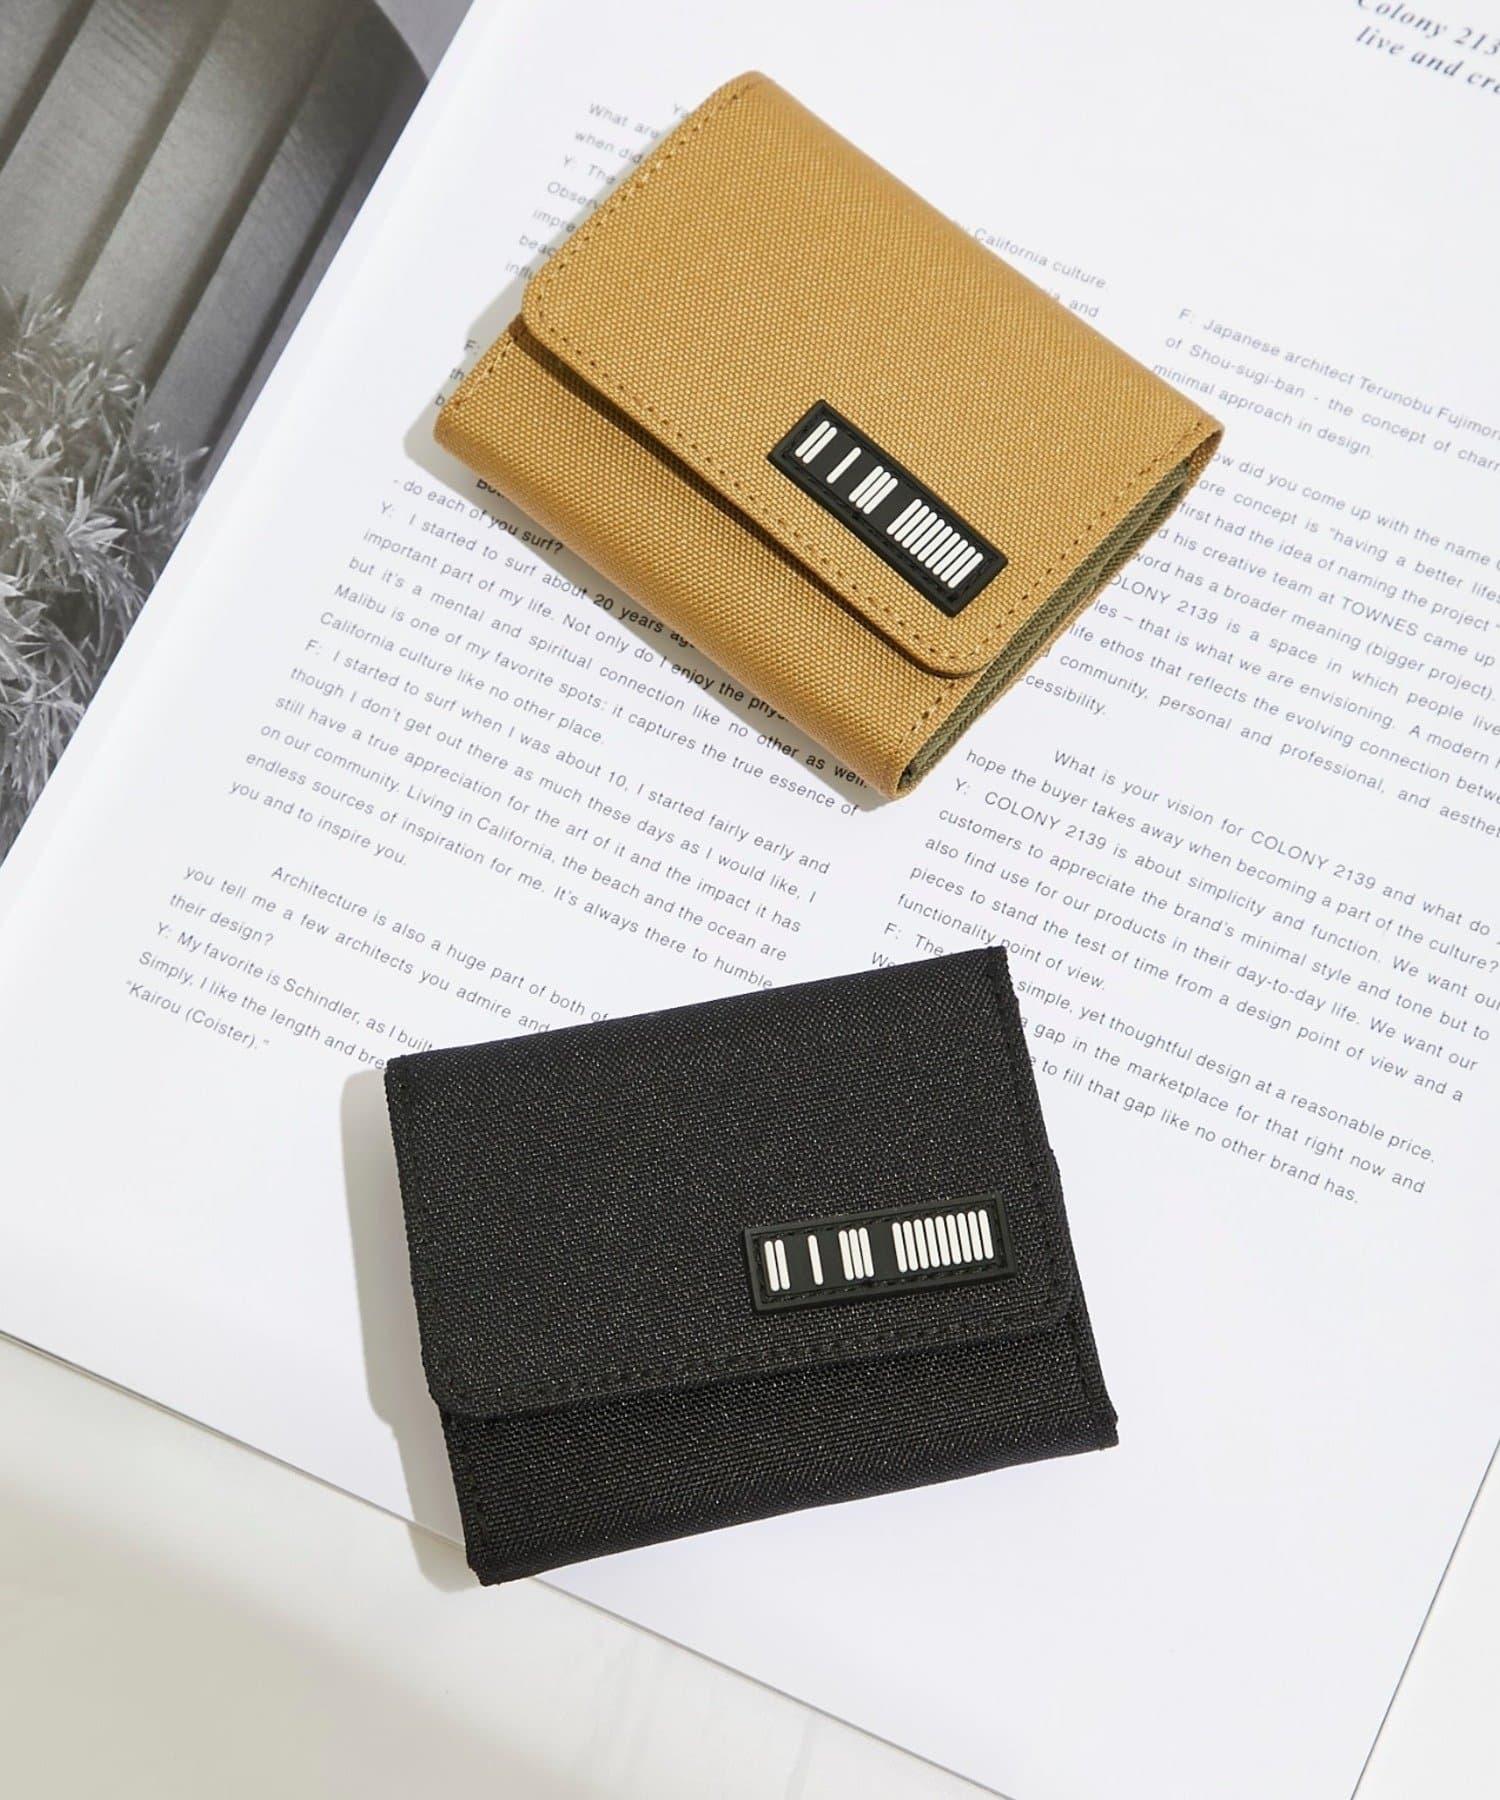 COLONY 2139(コロニー トゥーワンスリーナイン) メンズ 【MEN'S/ユニセックス】シリコンワッペン付き三つ折り財布3 ブラック